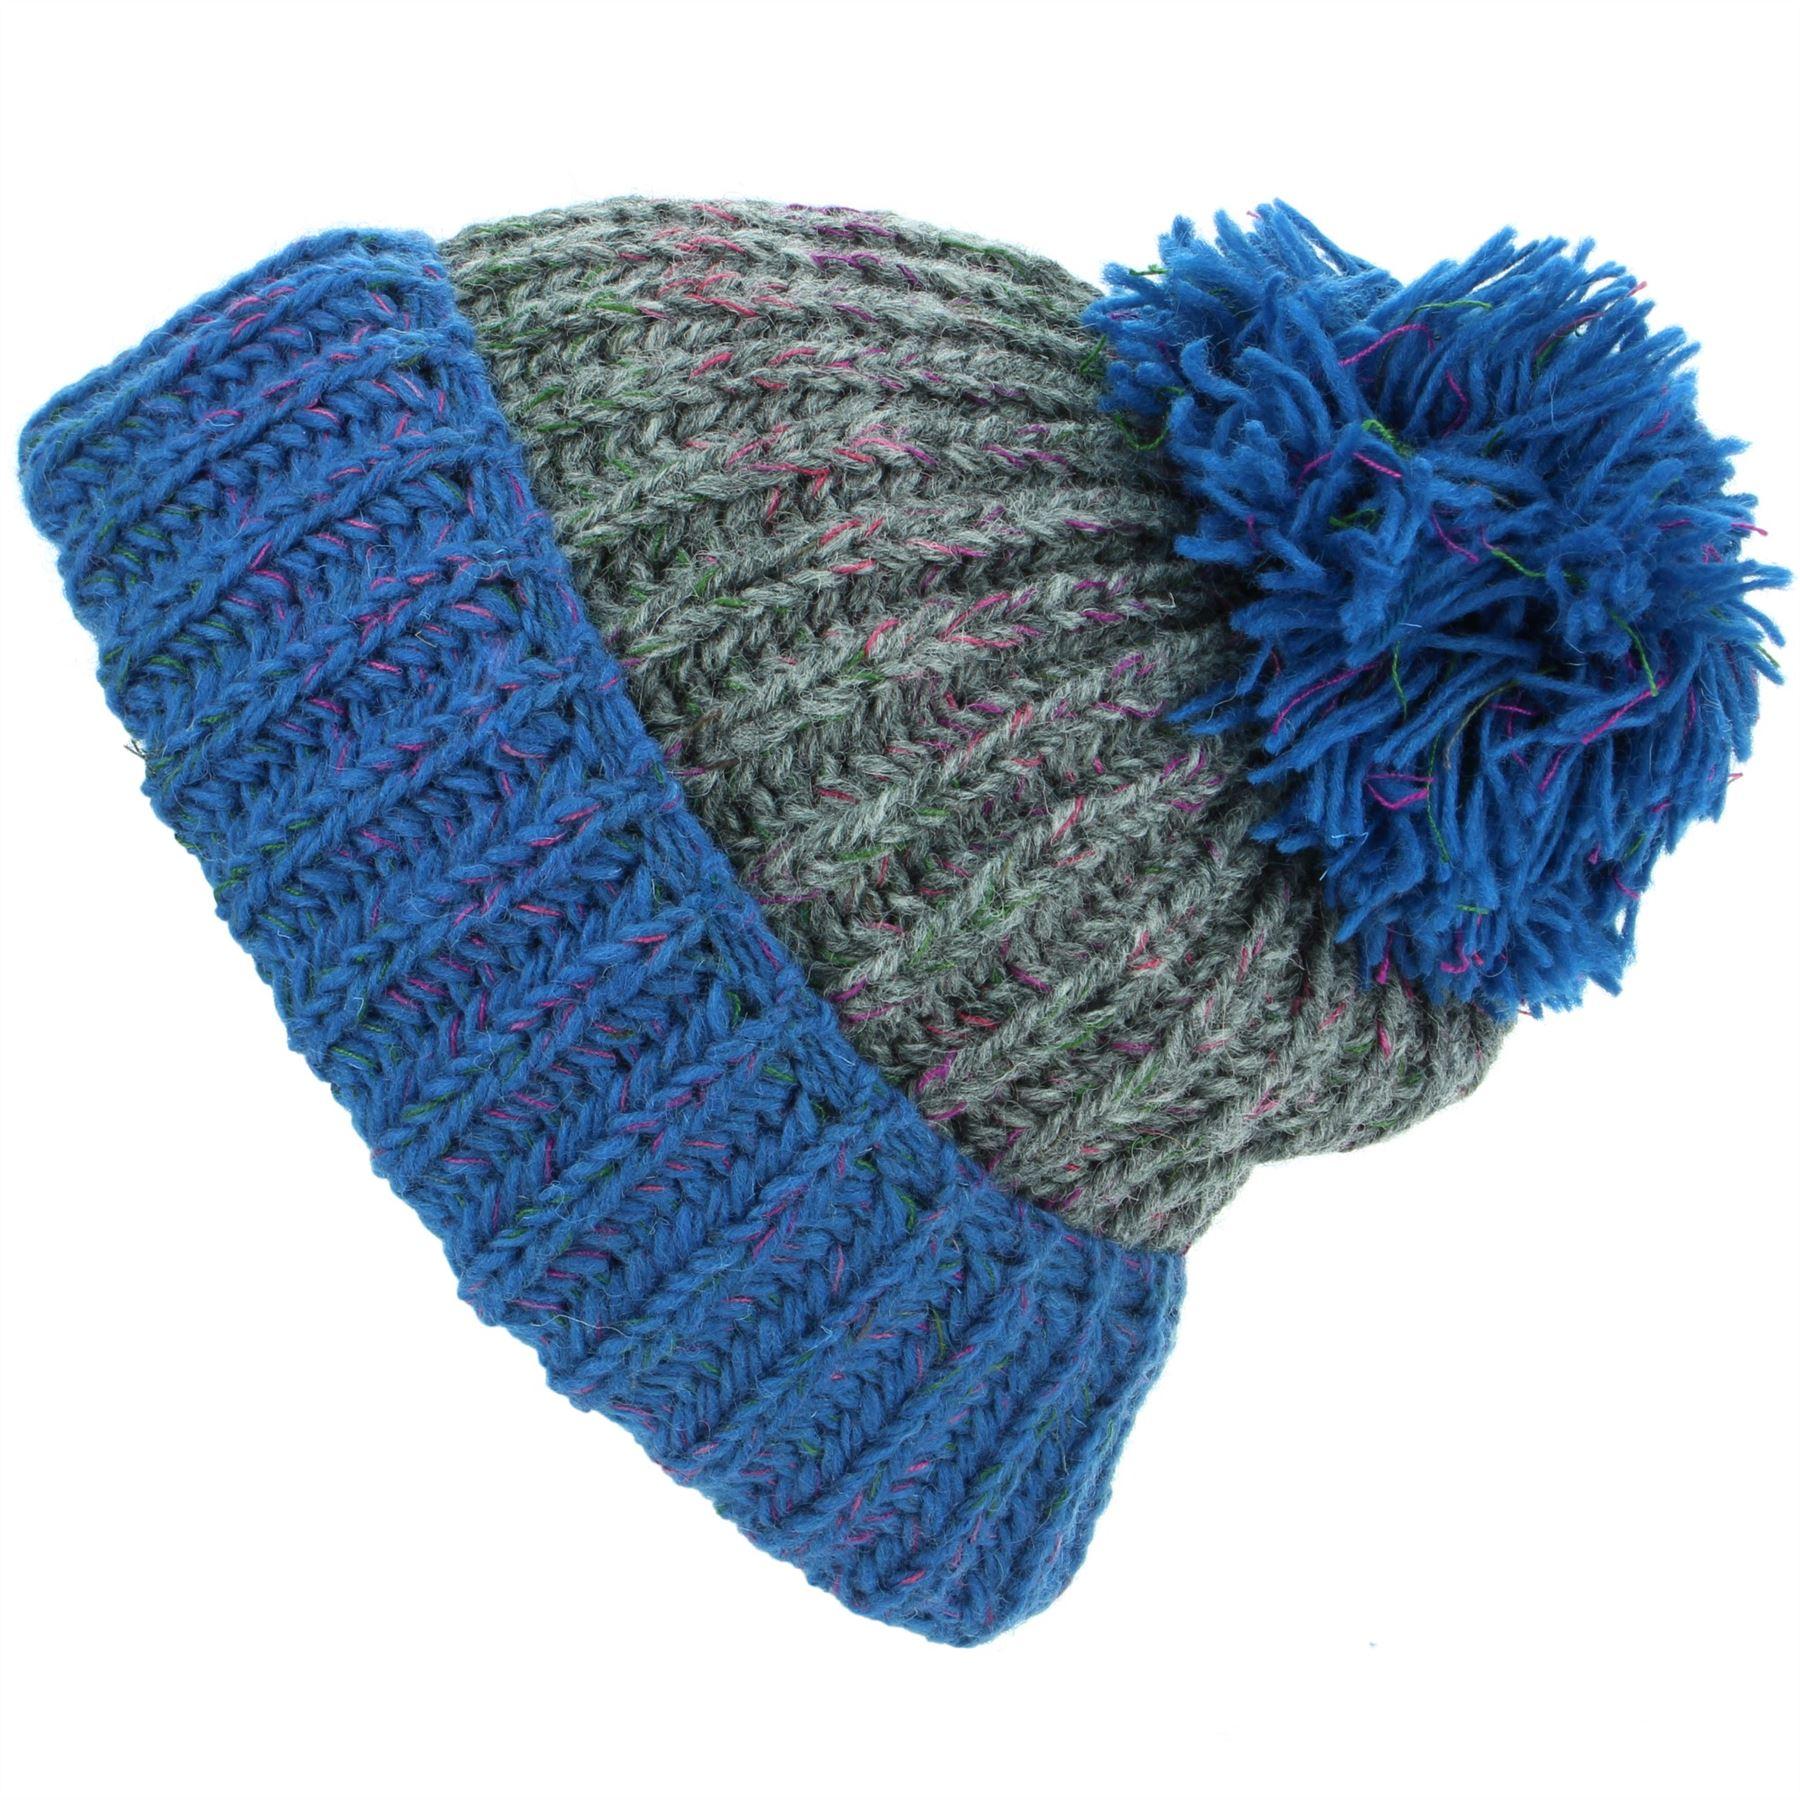 aa6d8b28345 Wool oatmeal Grey Beanie grey Knit Winter Bobble Grey Loudelephant Cream  dark navy Cream Warm Cap Blue Pink Hat purple Ribbed Lined amp  Ski Dark  q15CS